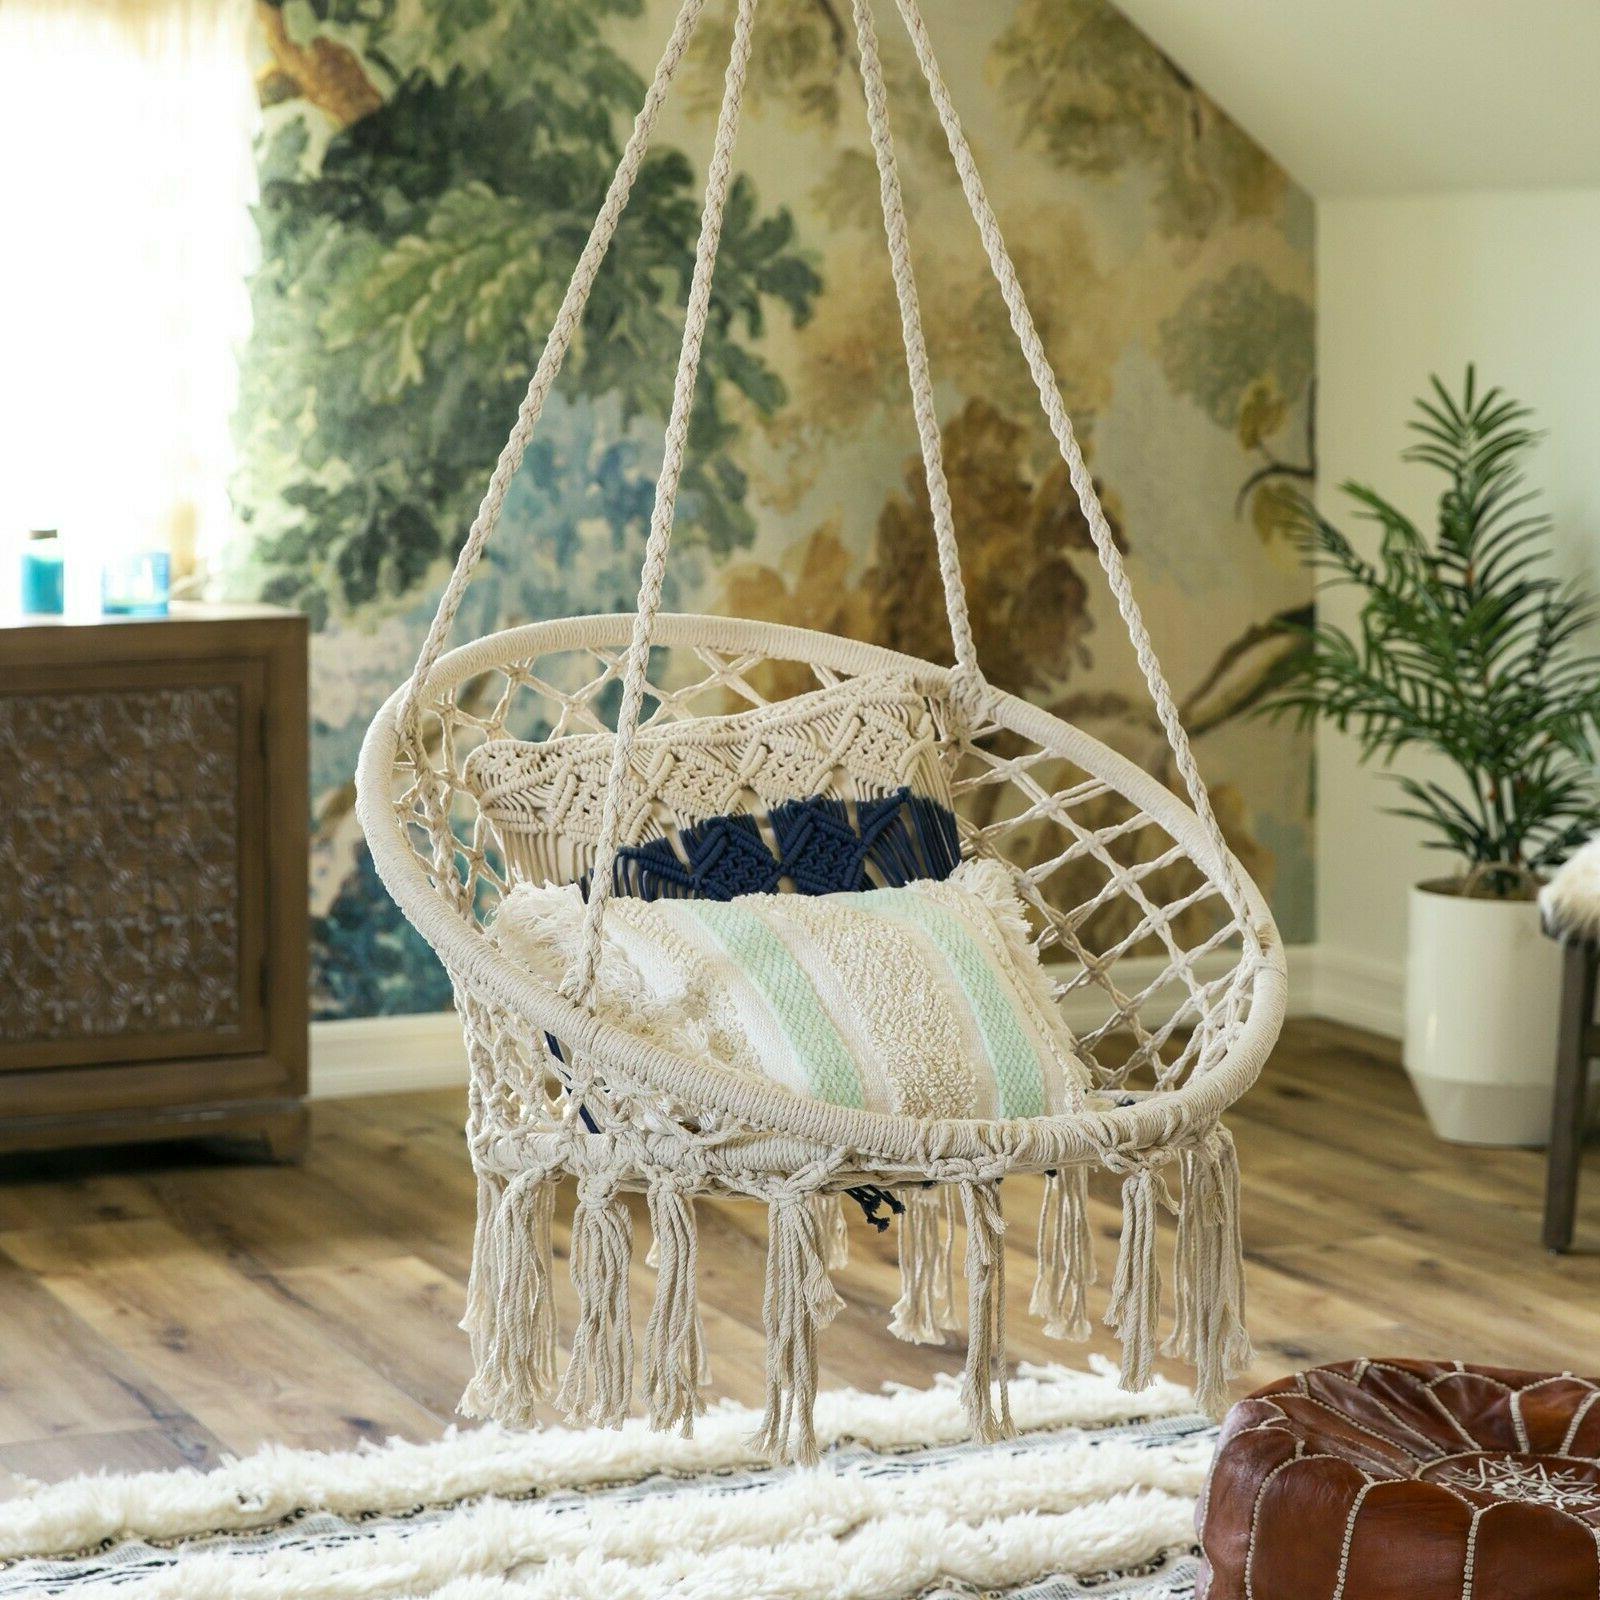 Hammock Handmade Chair Hanging Outdoor Best Tassel W